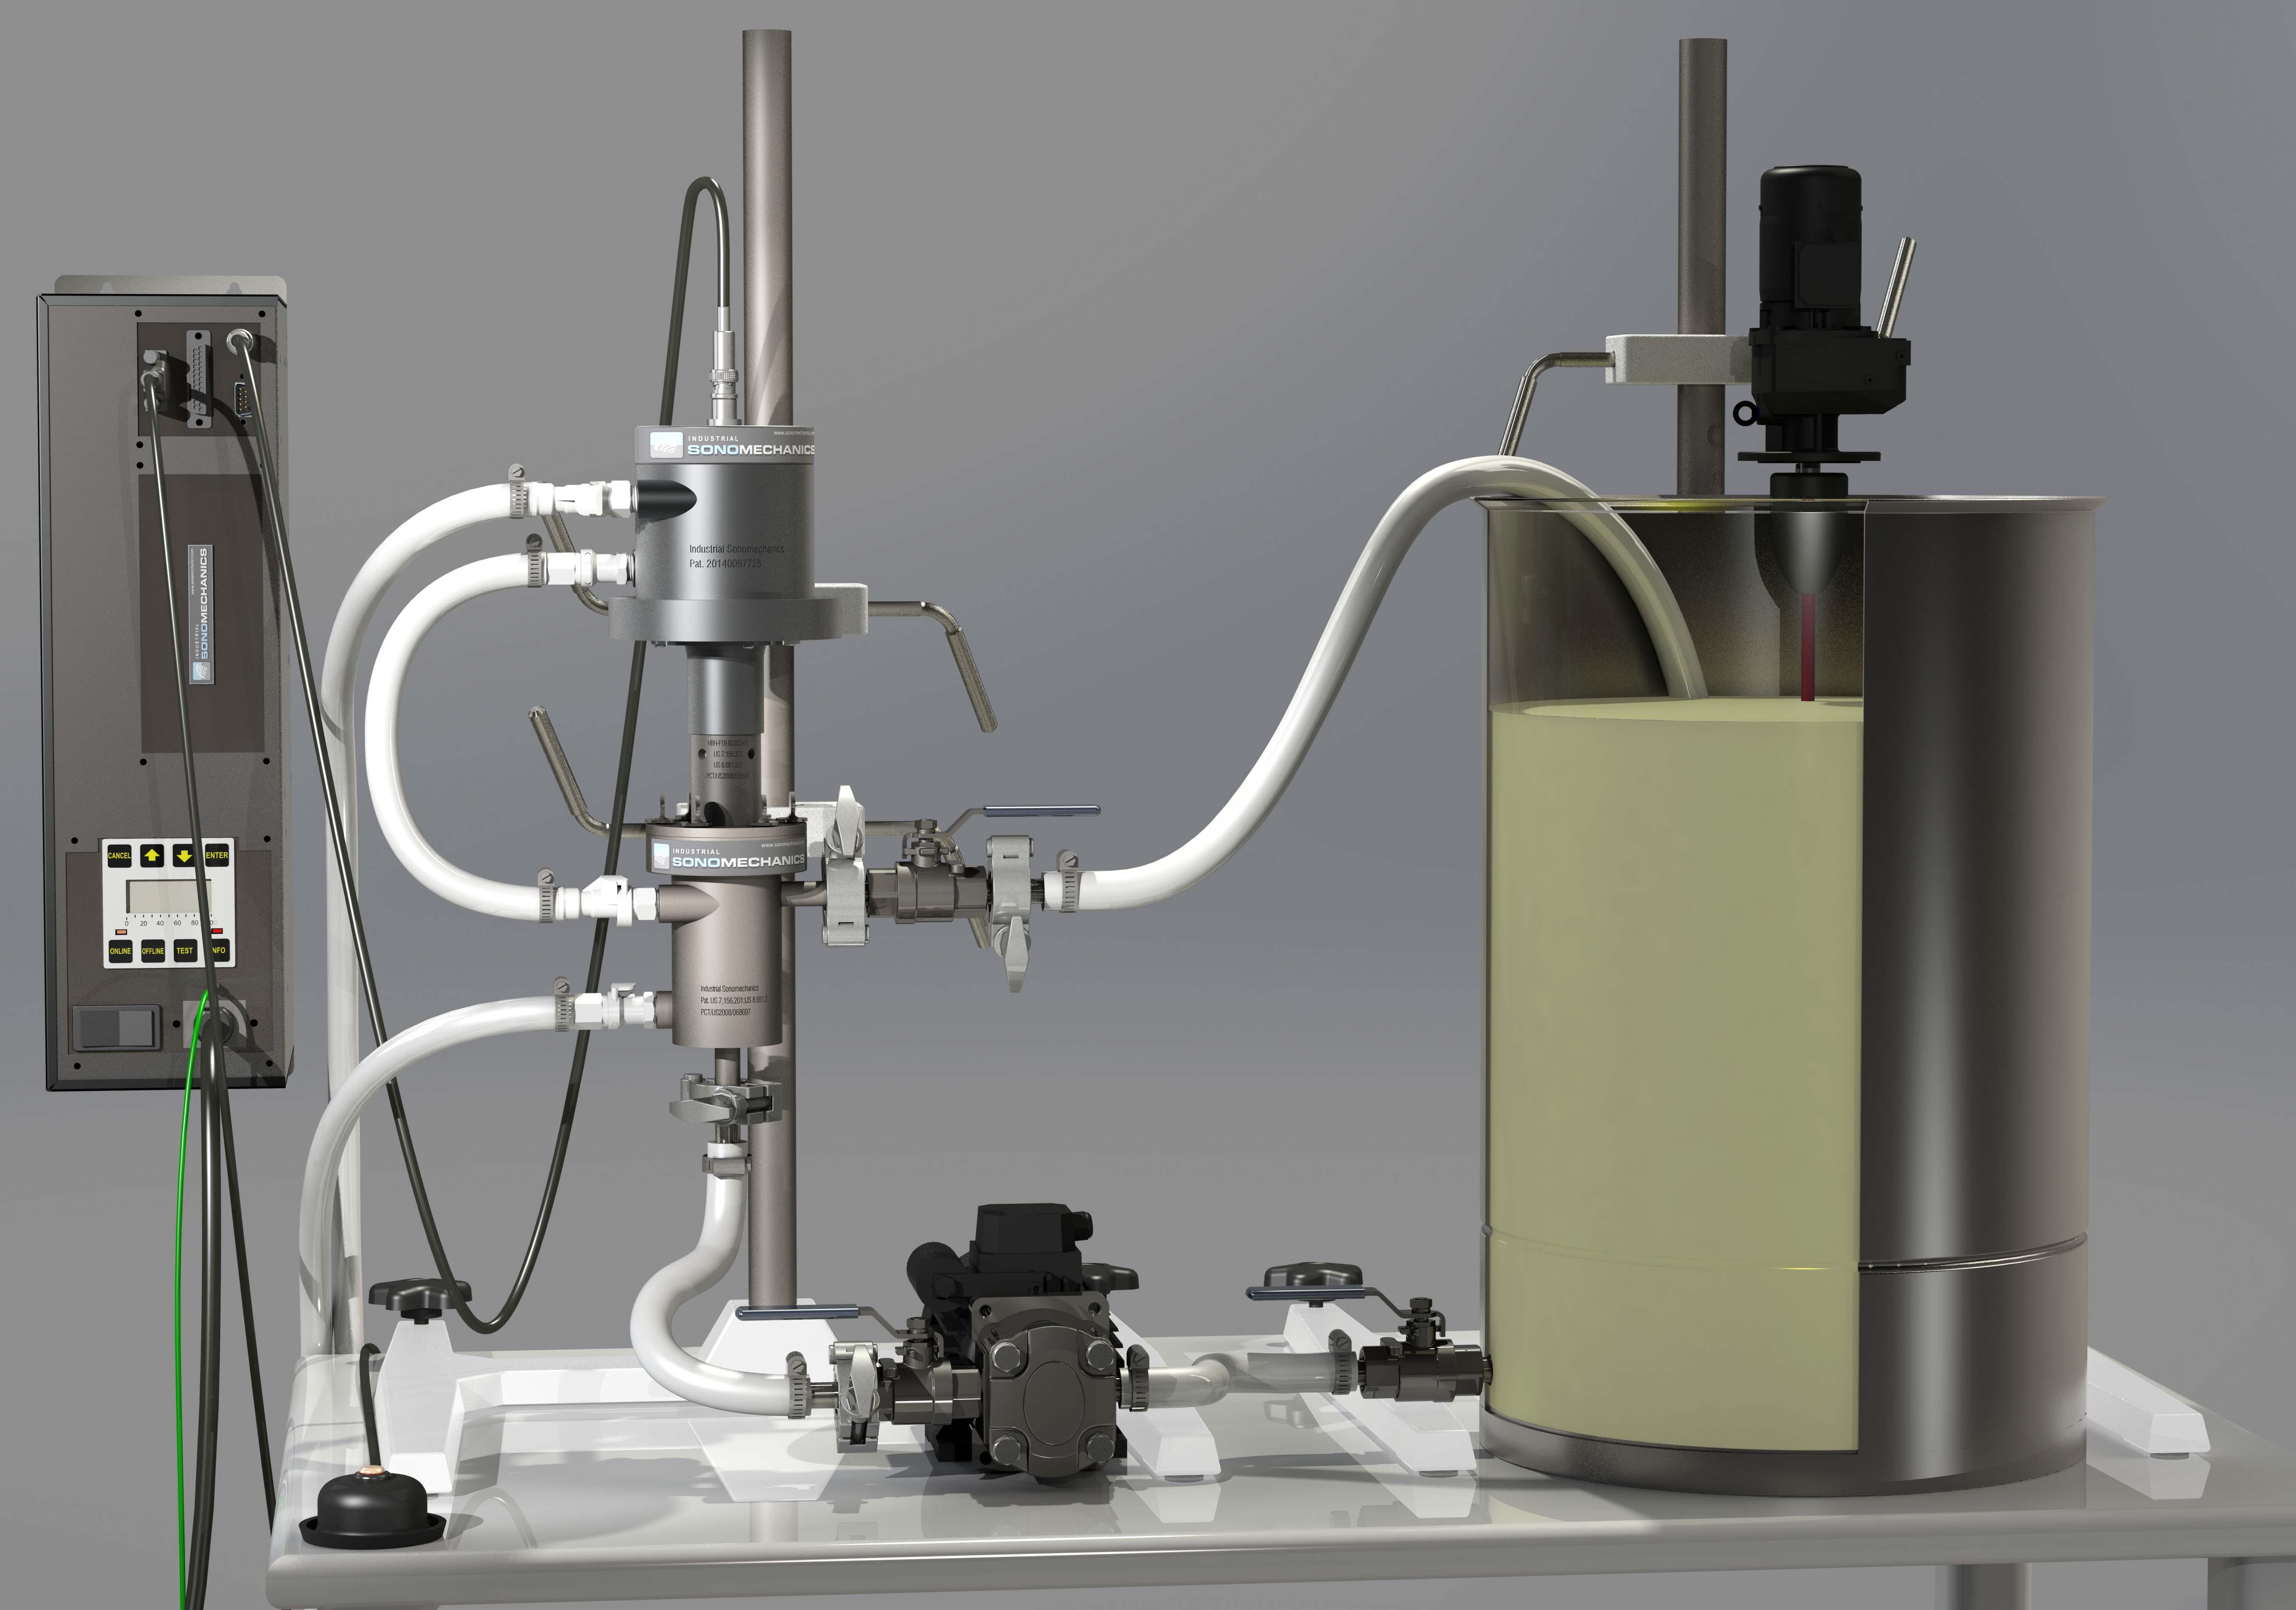 BSP-1200 ultrasonic liquid processor